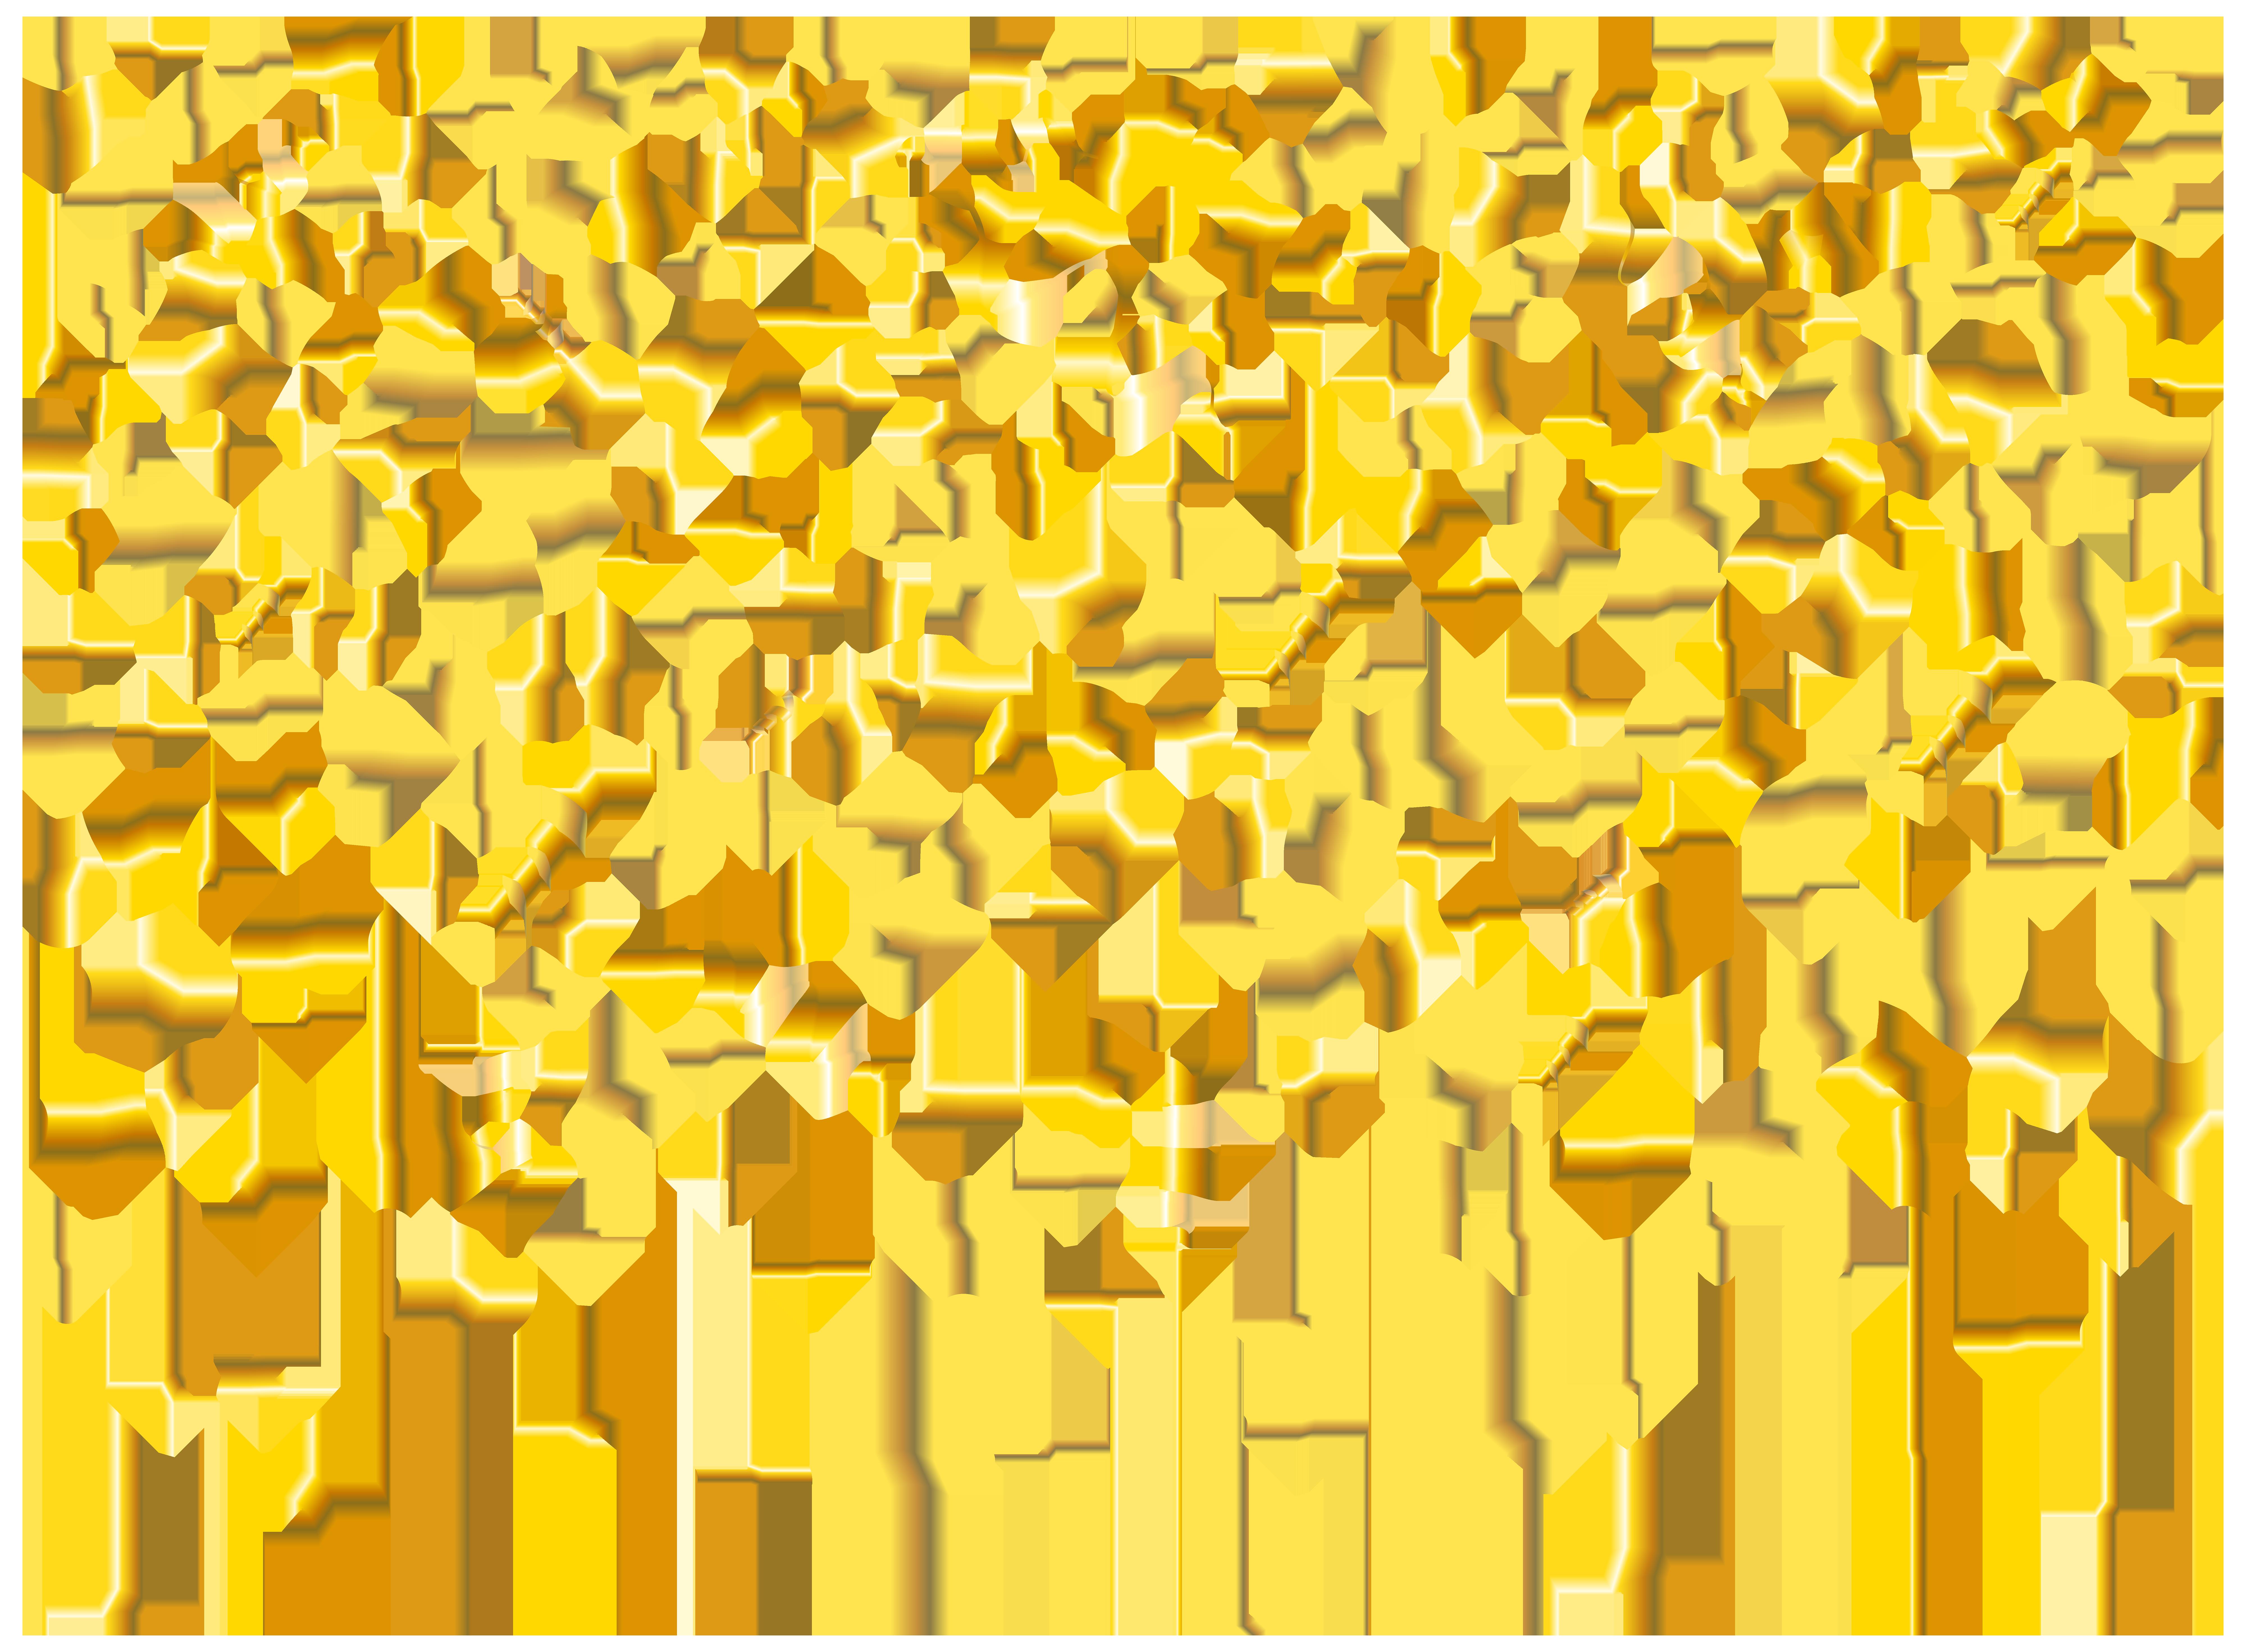 Confetti Picture Image #39086 - Confetti, Transparent background PNG HD thumbnail